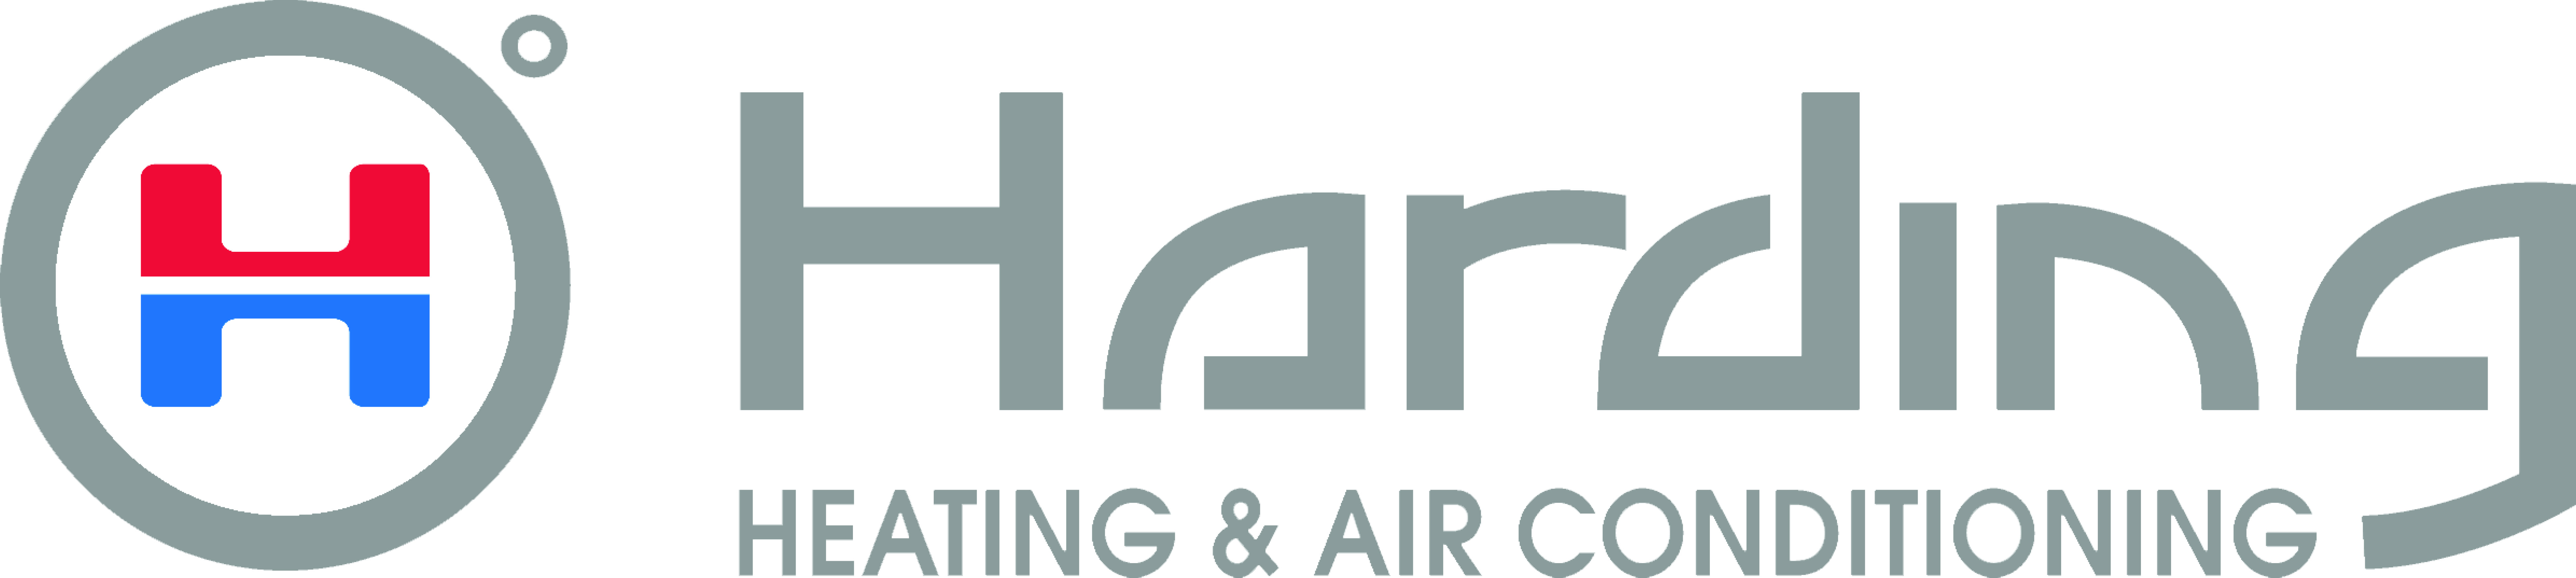 Player Gift Sponsor - Harding Heating & Air Conditioning - Logo